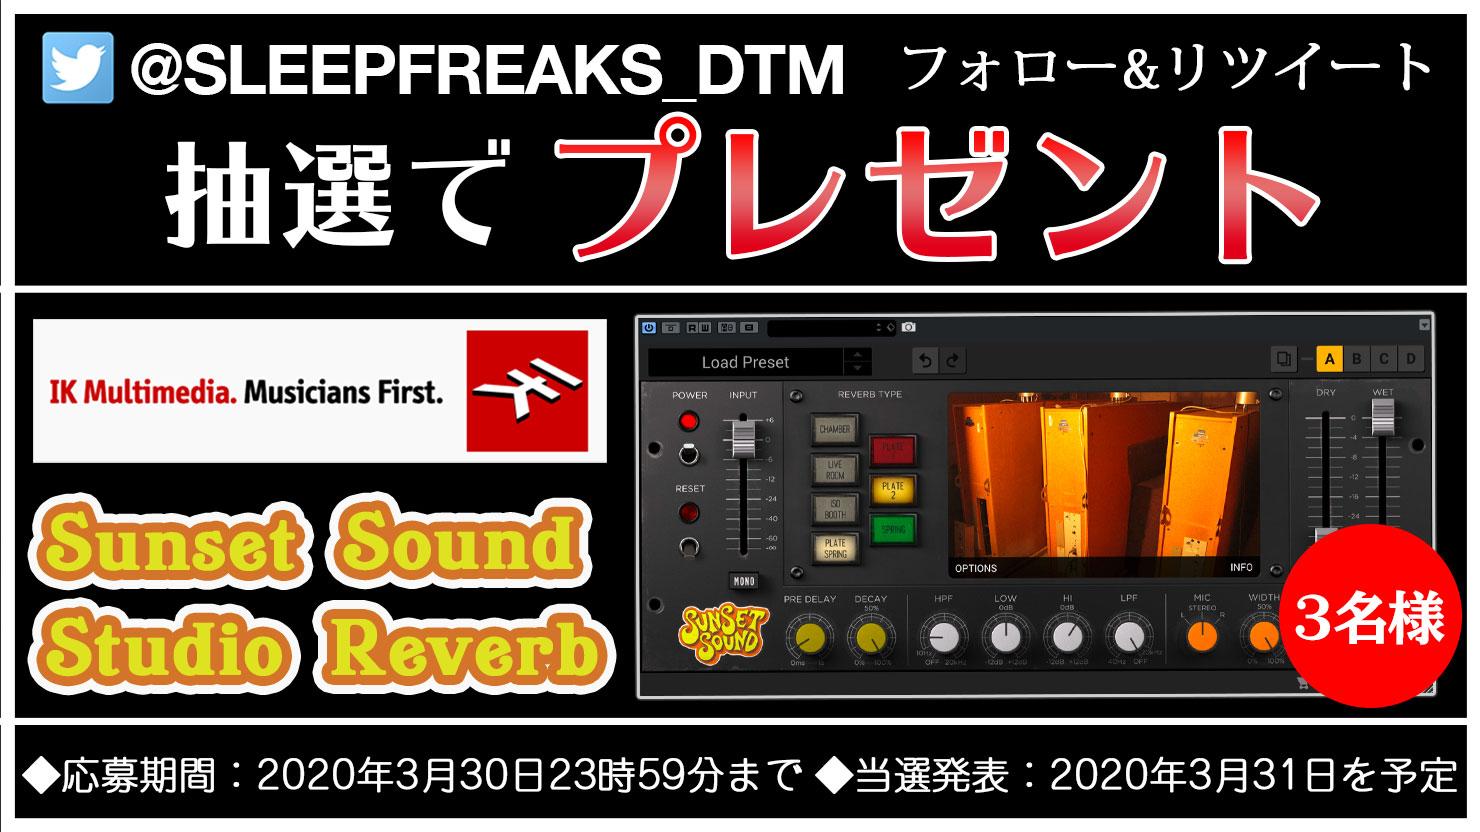 Present-IK-Multimedia-T-RackS-Sunset-Sound-Studio-Reverb-Top